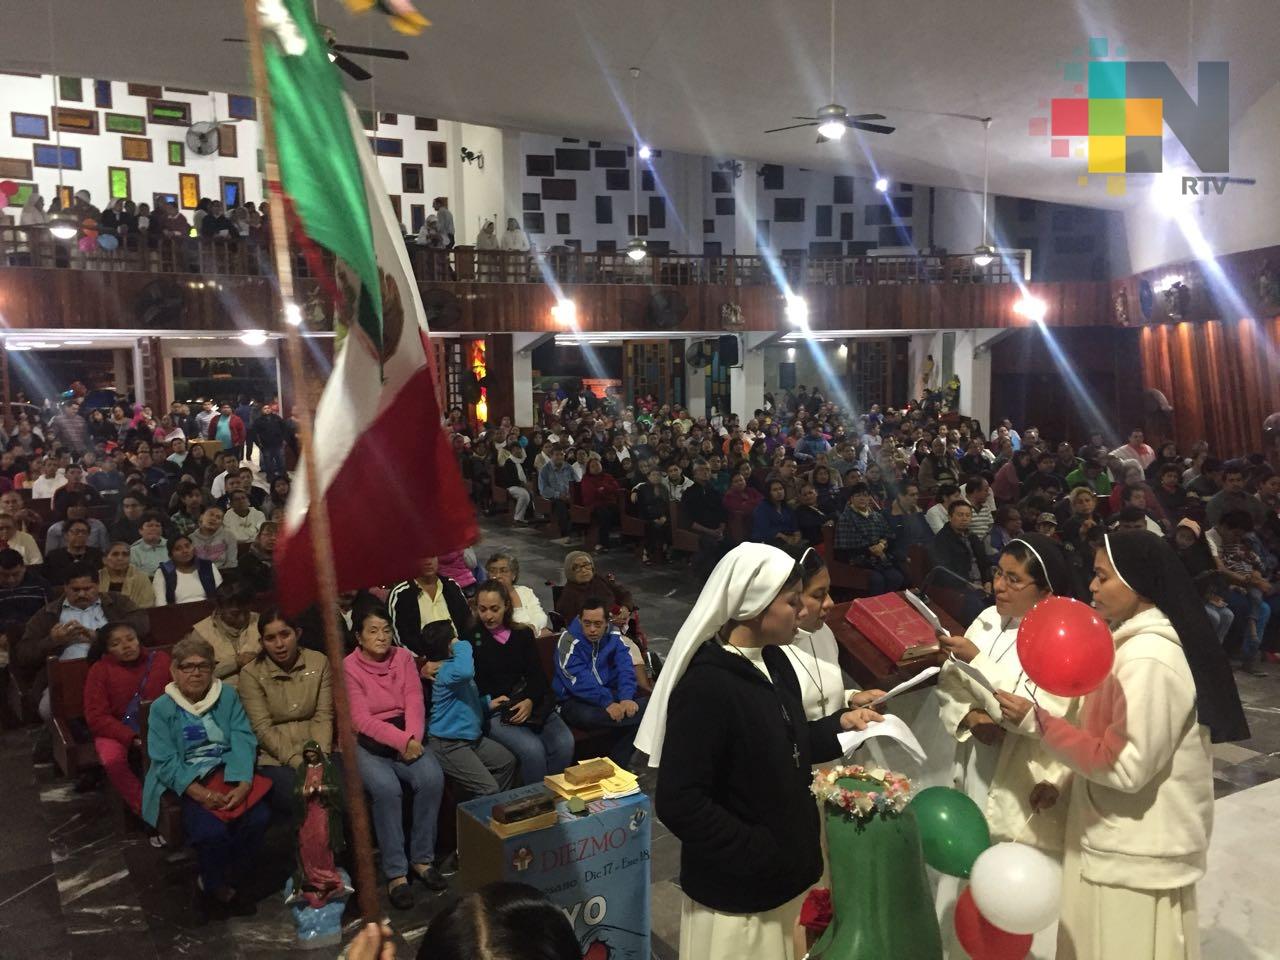 Celebran feligreses de Coatzacoalcos a la Virgen de Guadalupe